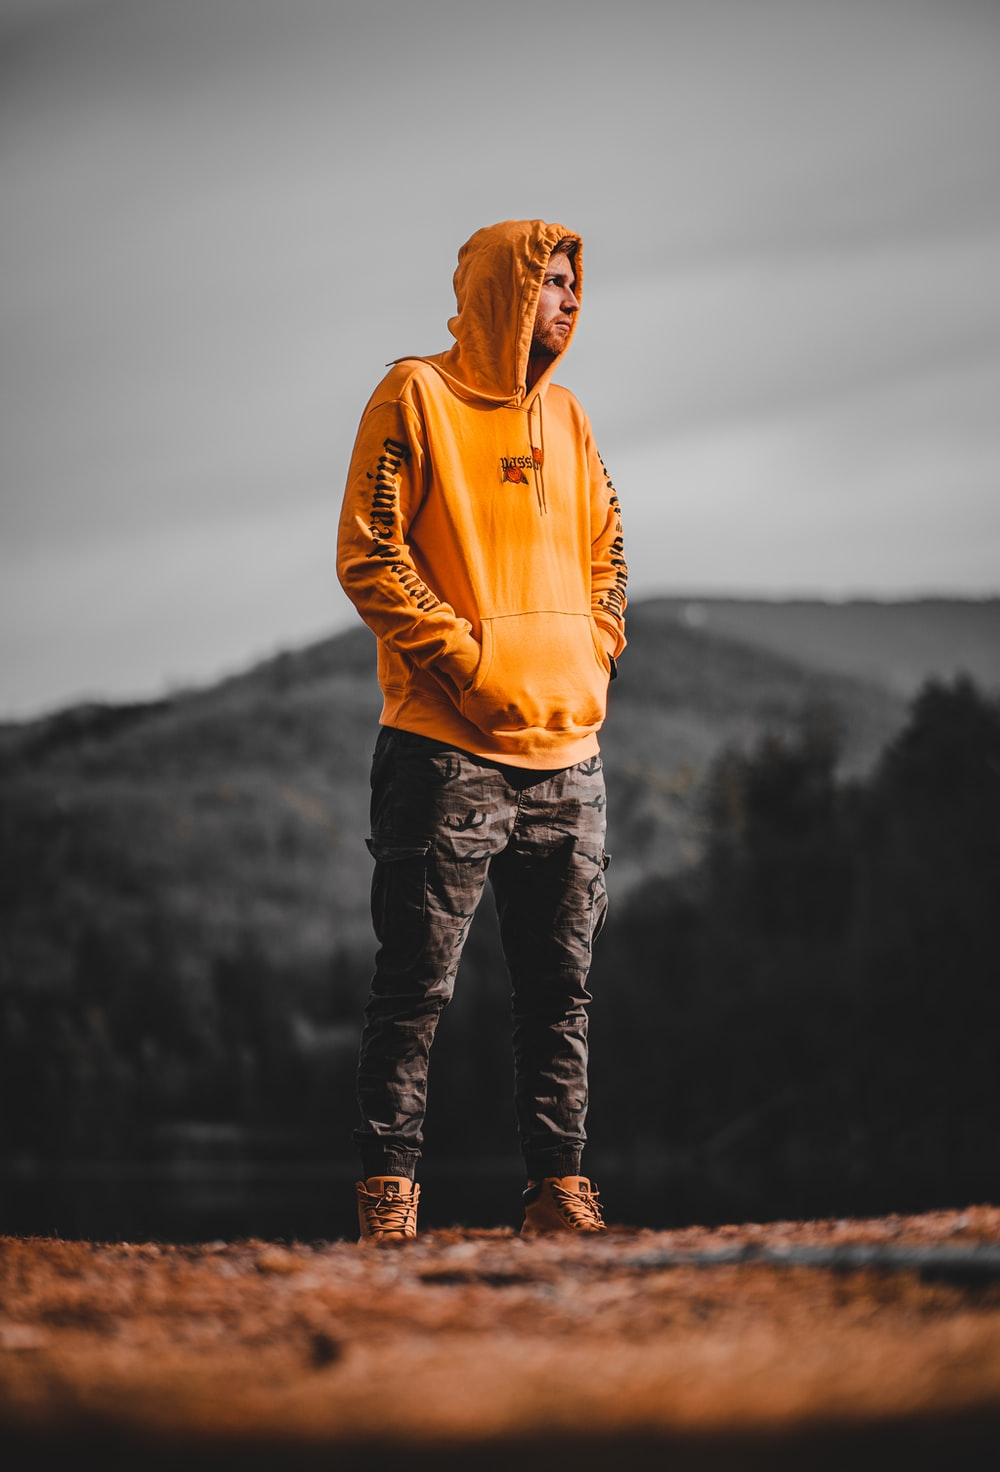 man in orange hoodie standing on rock near body of water during daytime